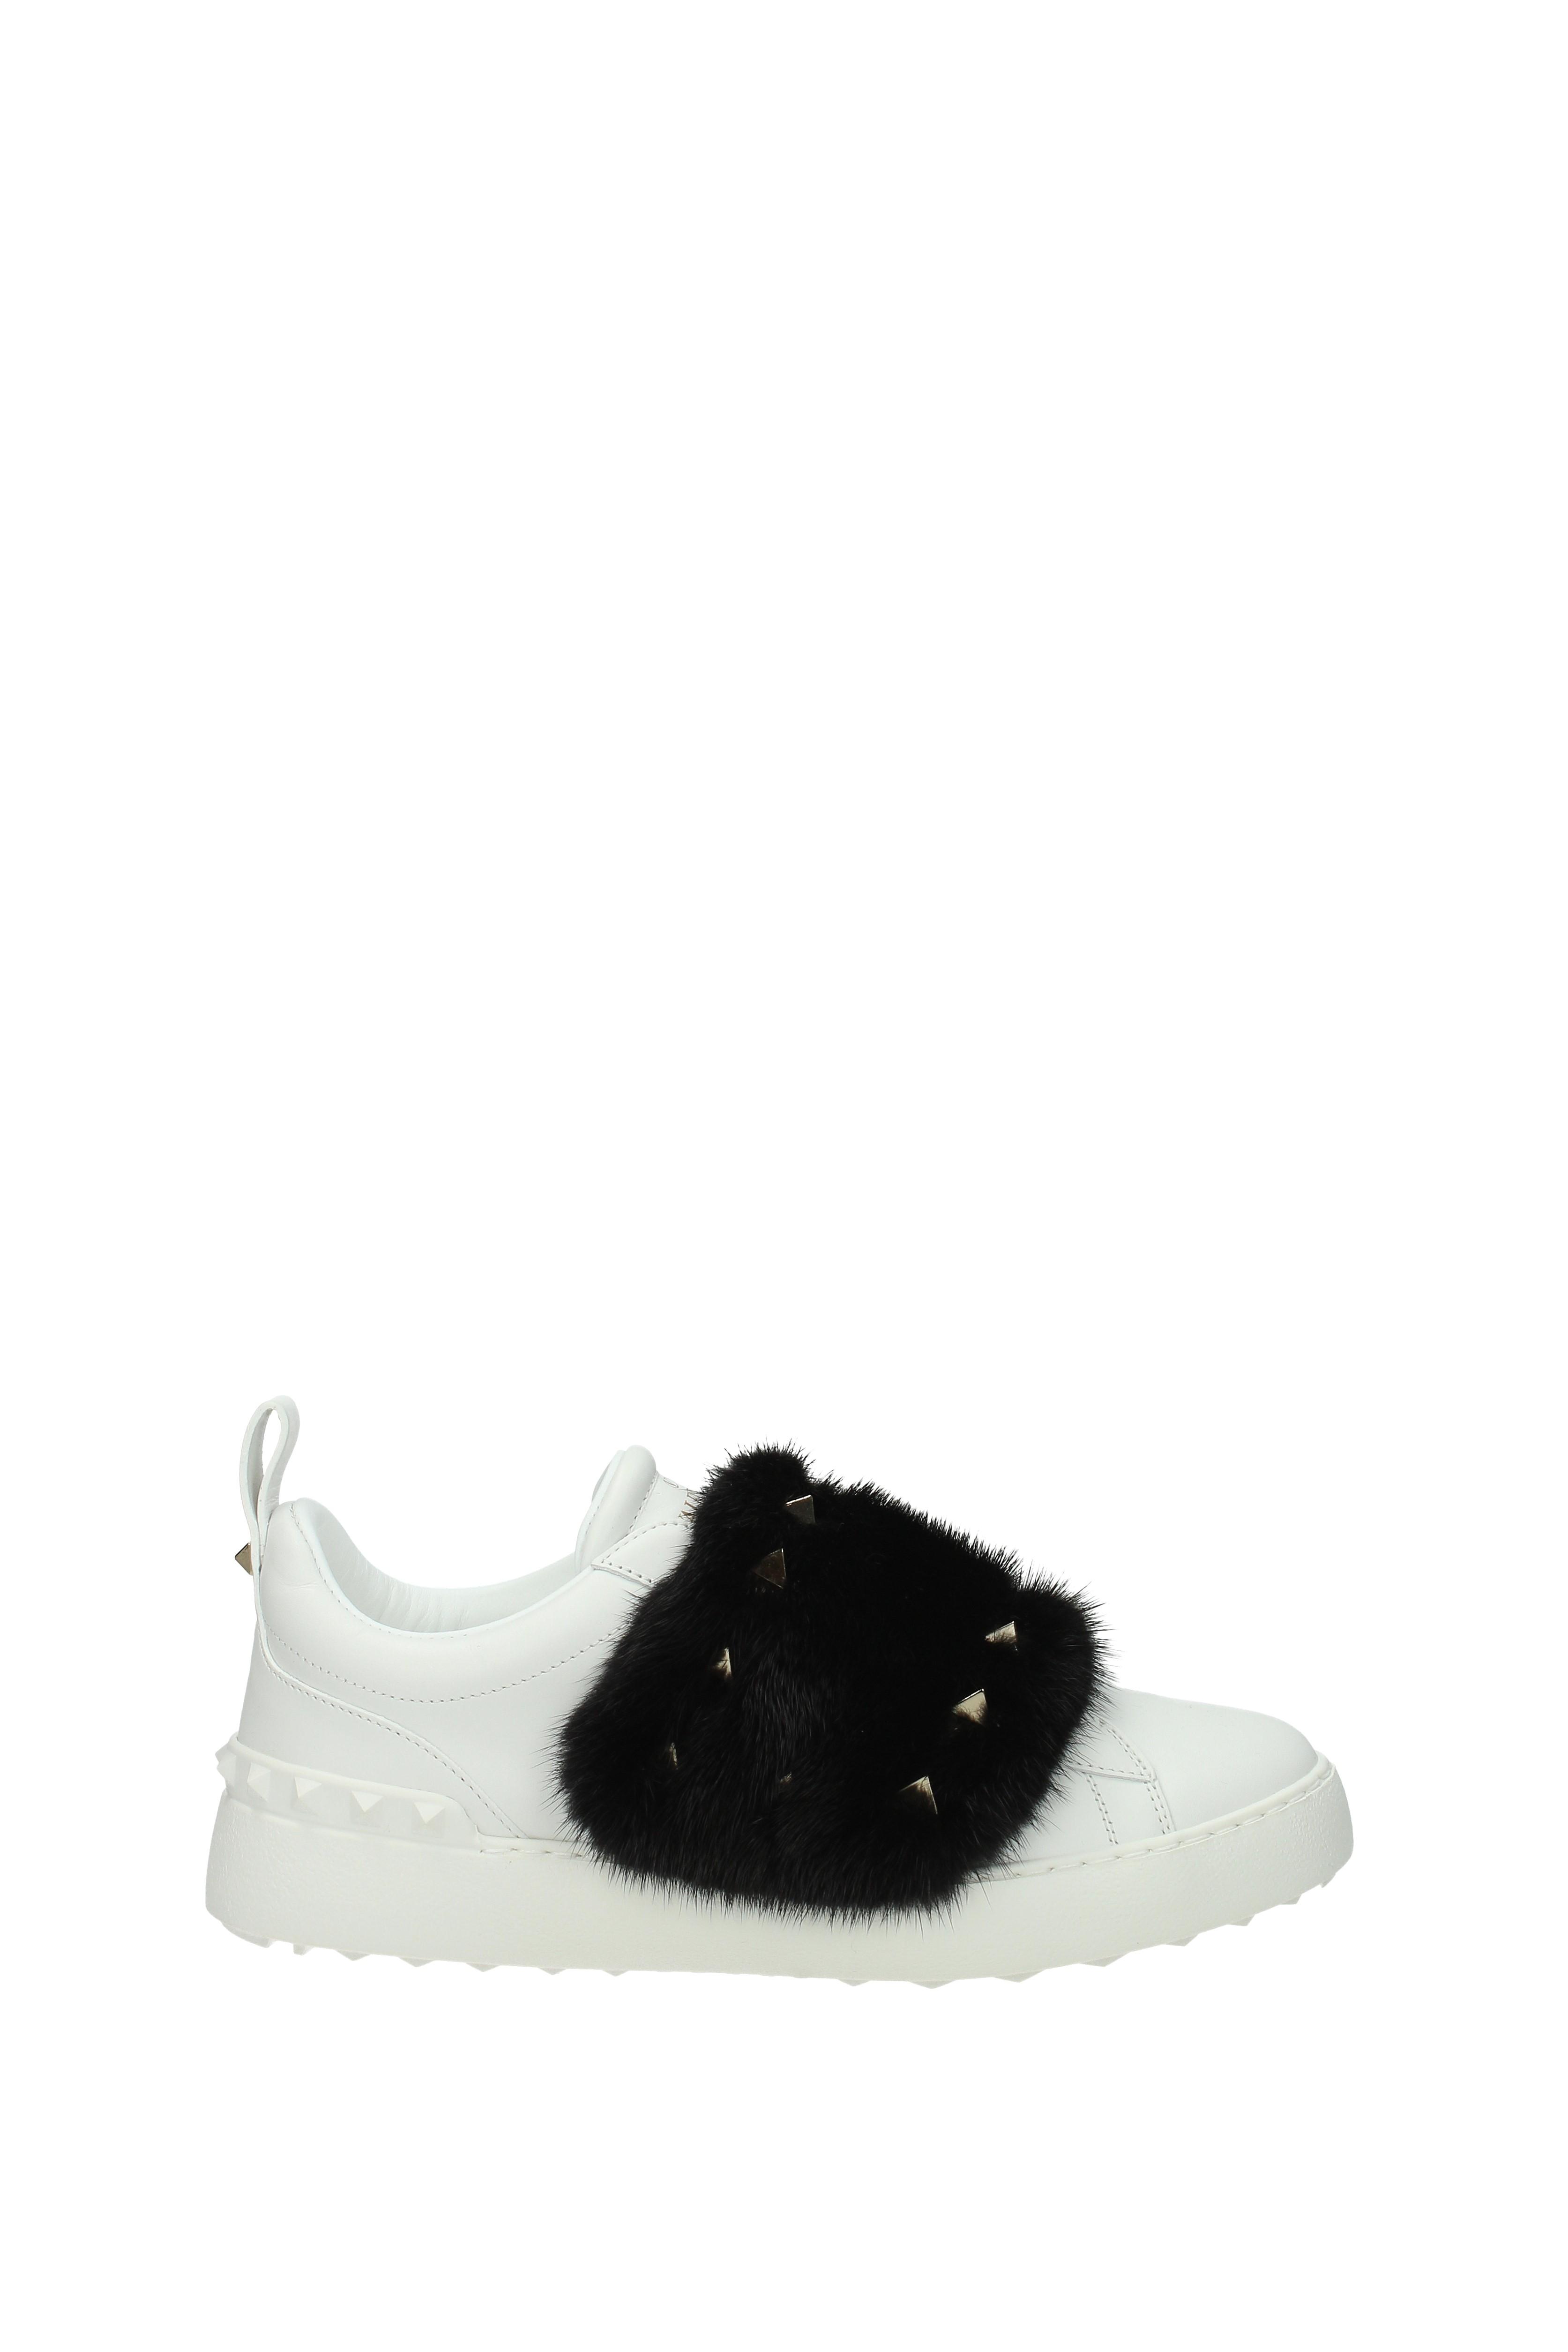 Sneakers Valentino Garavani - Damen - Garavani Leder (2S0E11UEW) c1b0e3